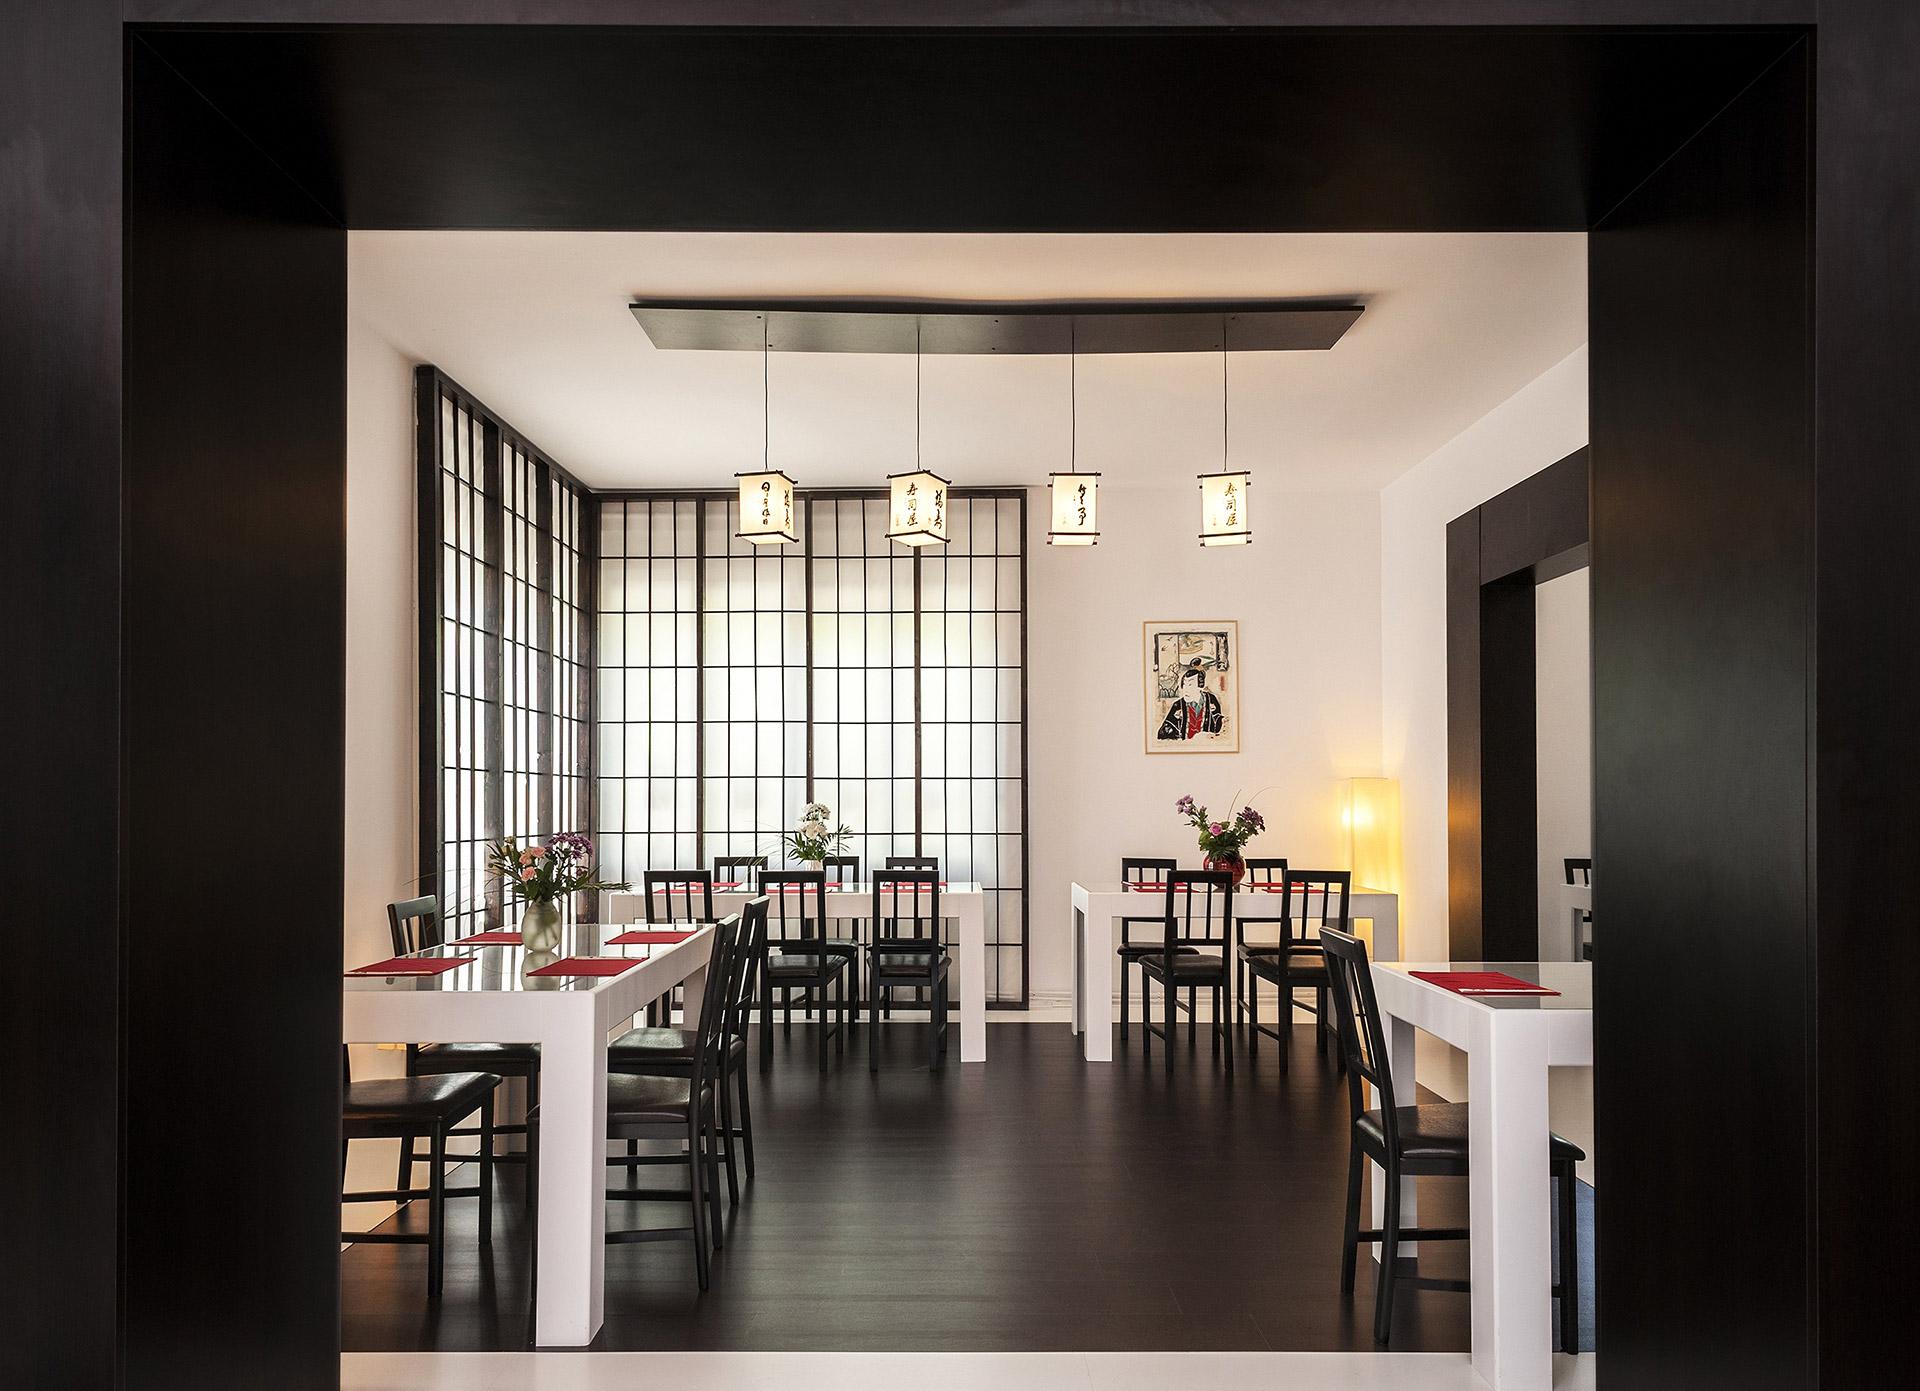 O-ZEN Portfolio Sushi Ya Innendesign Elemente Massarbeit Japanische Lampen, Mahlerei und Shoji